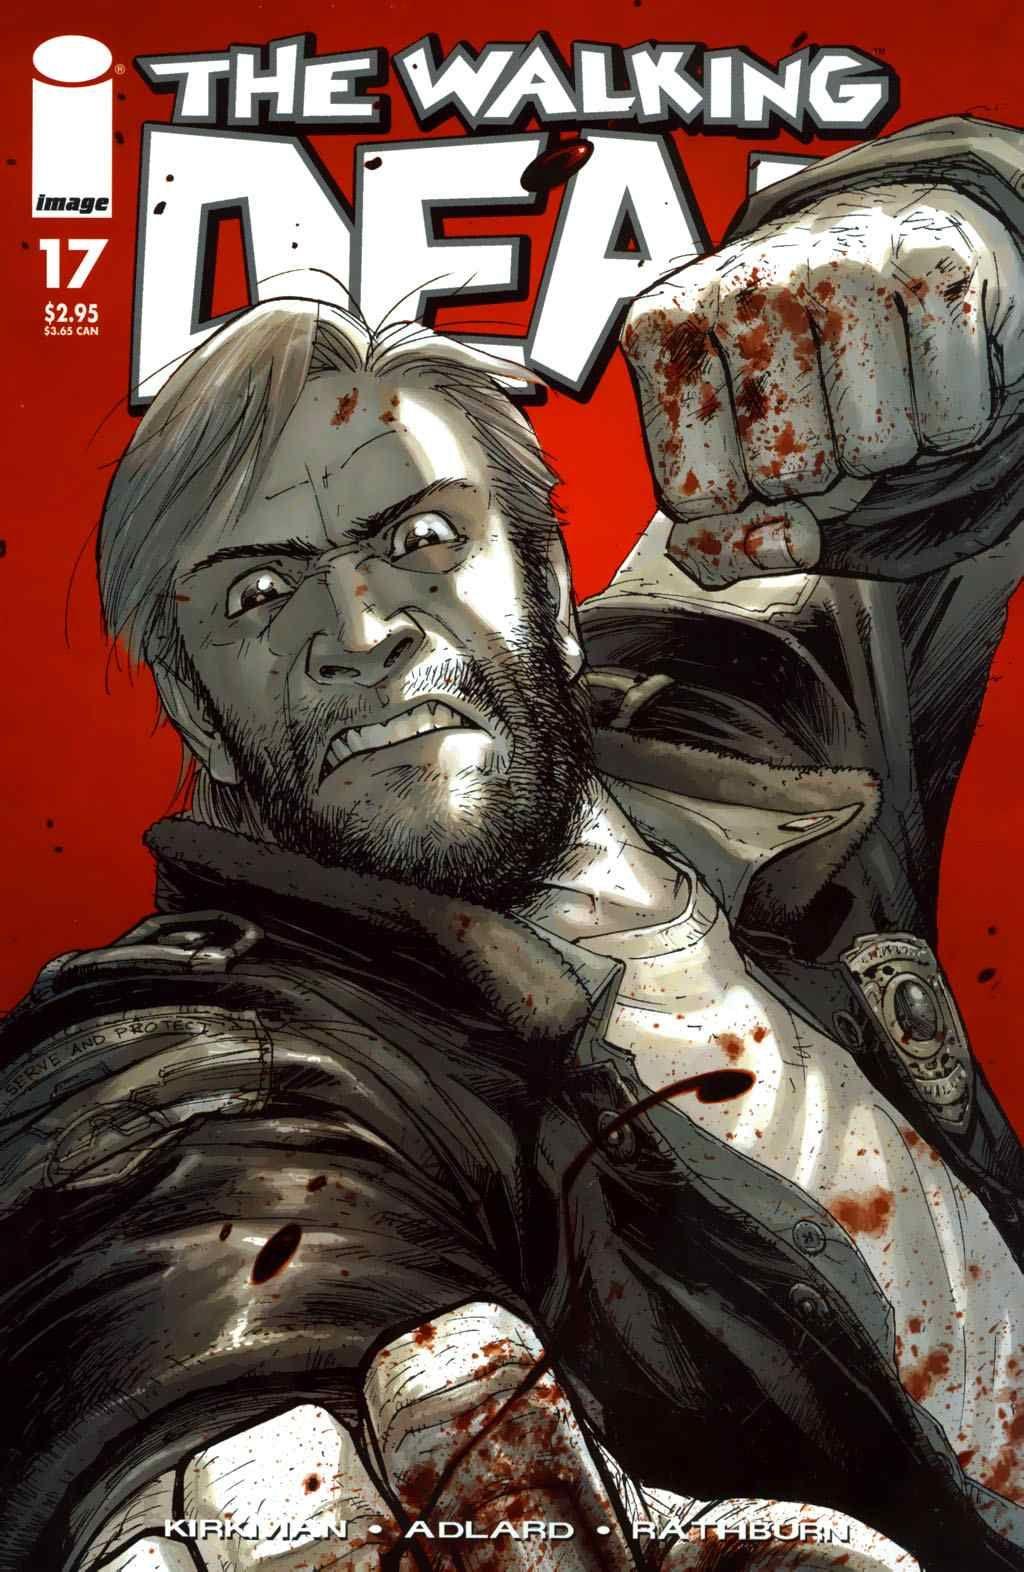 Read Comics Online Free - The Walking Dead - Chapter 017